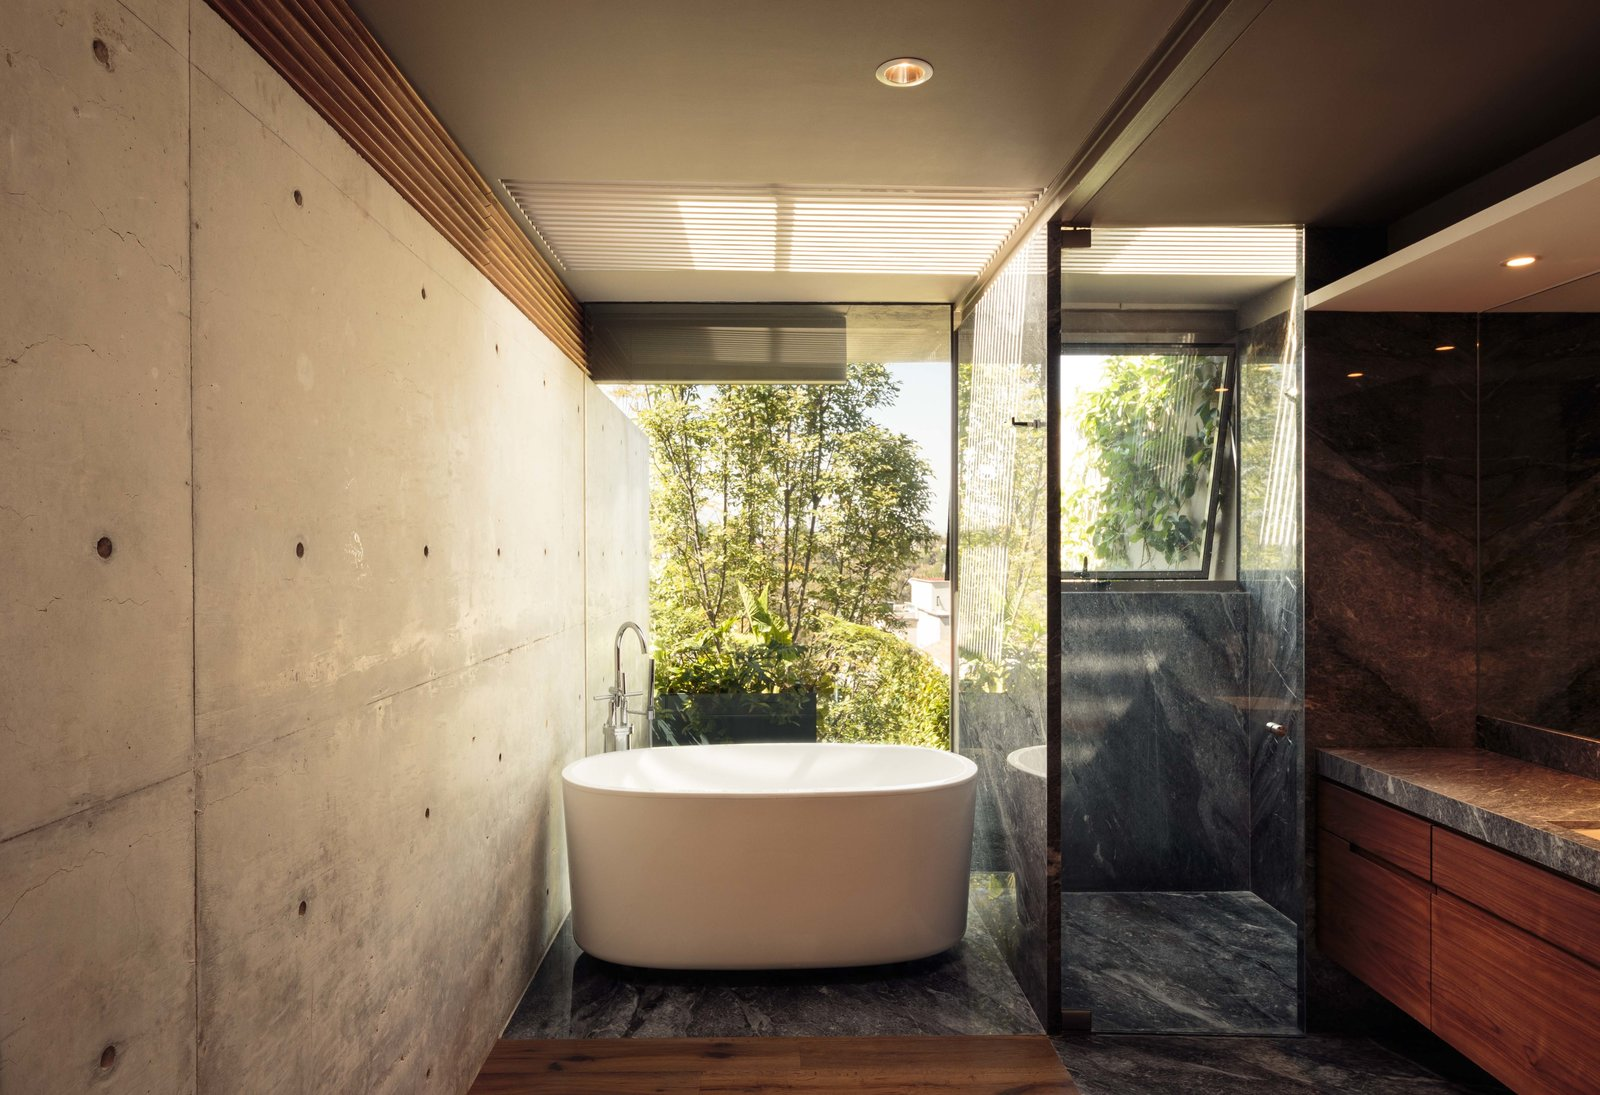 Bath Room, Granite Counter, Medium Hardwood Floor, Soaking Tub, Enclosed Shower, Freestanding Tub, Recessed Lighting, and Concrete Wall CAUCASO  Caucaso by Jose Juan Rivera Rio